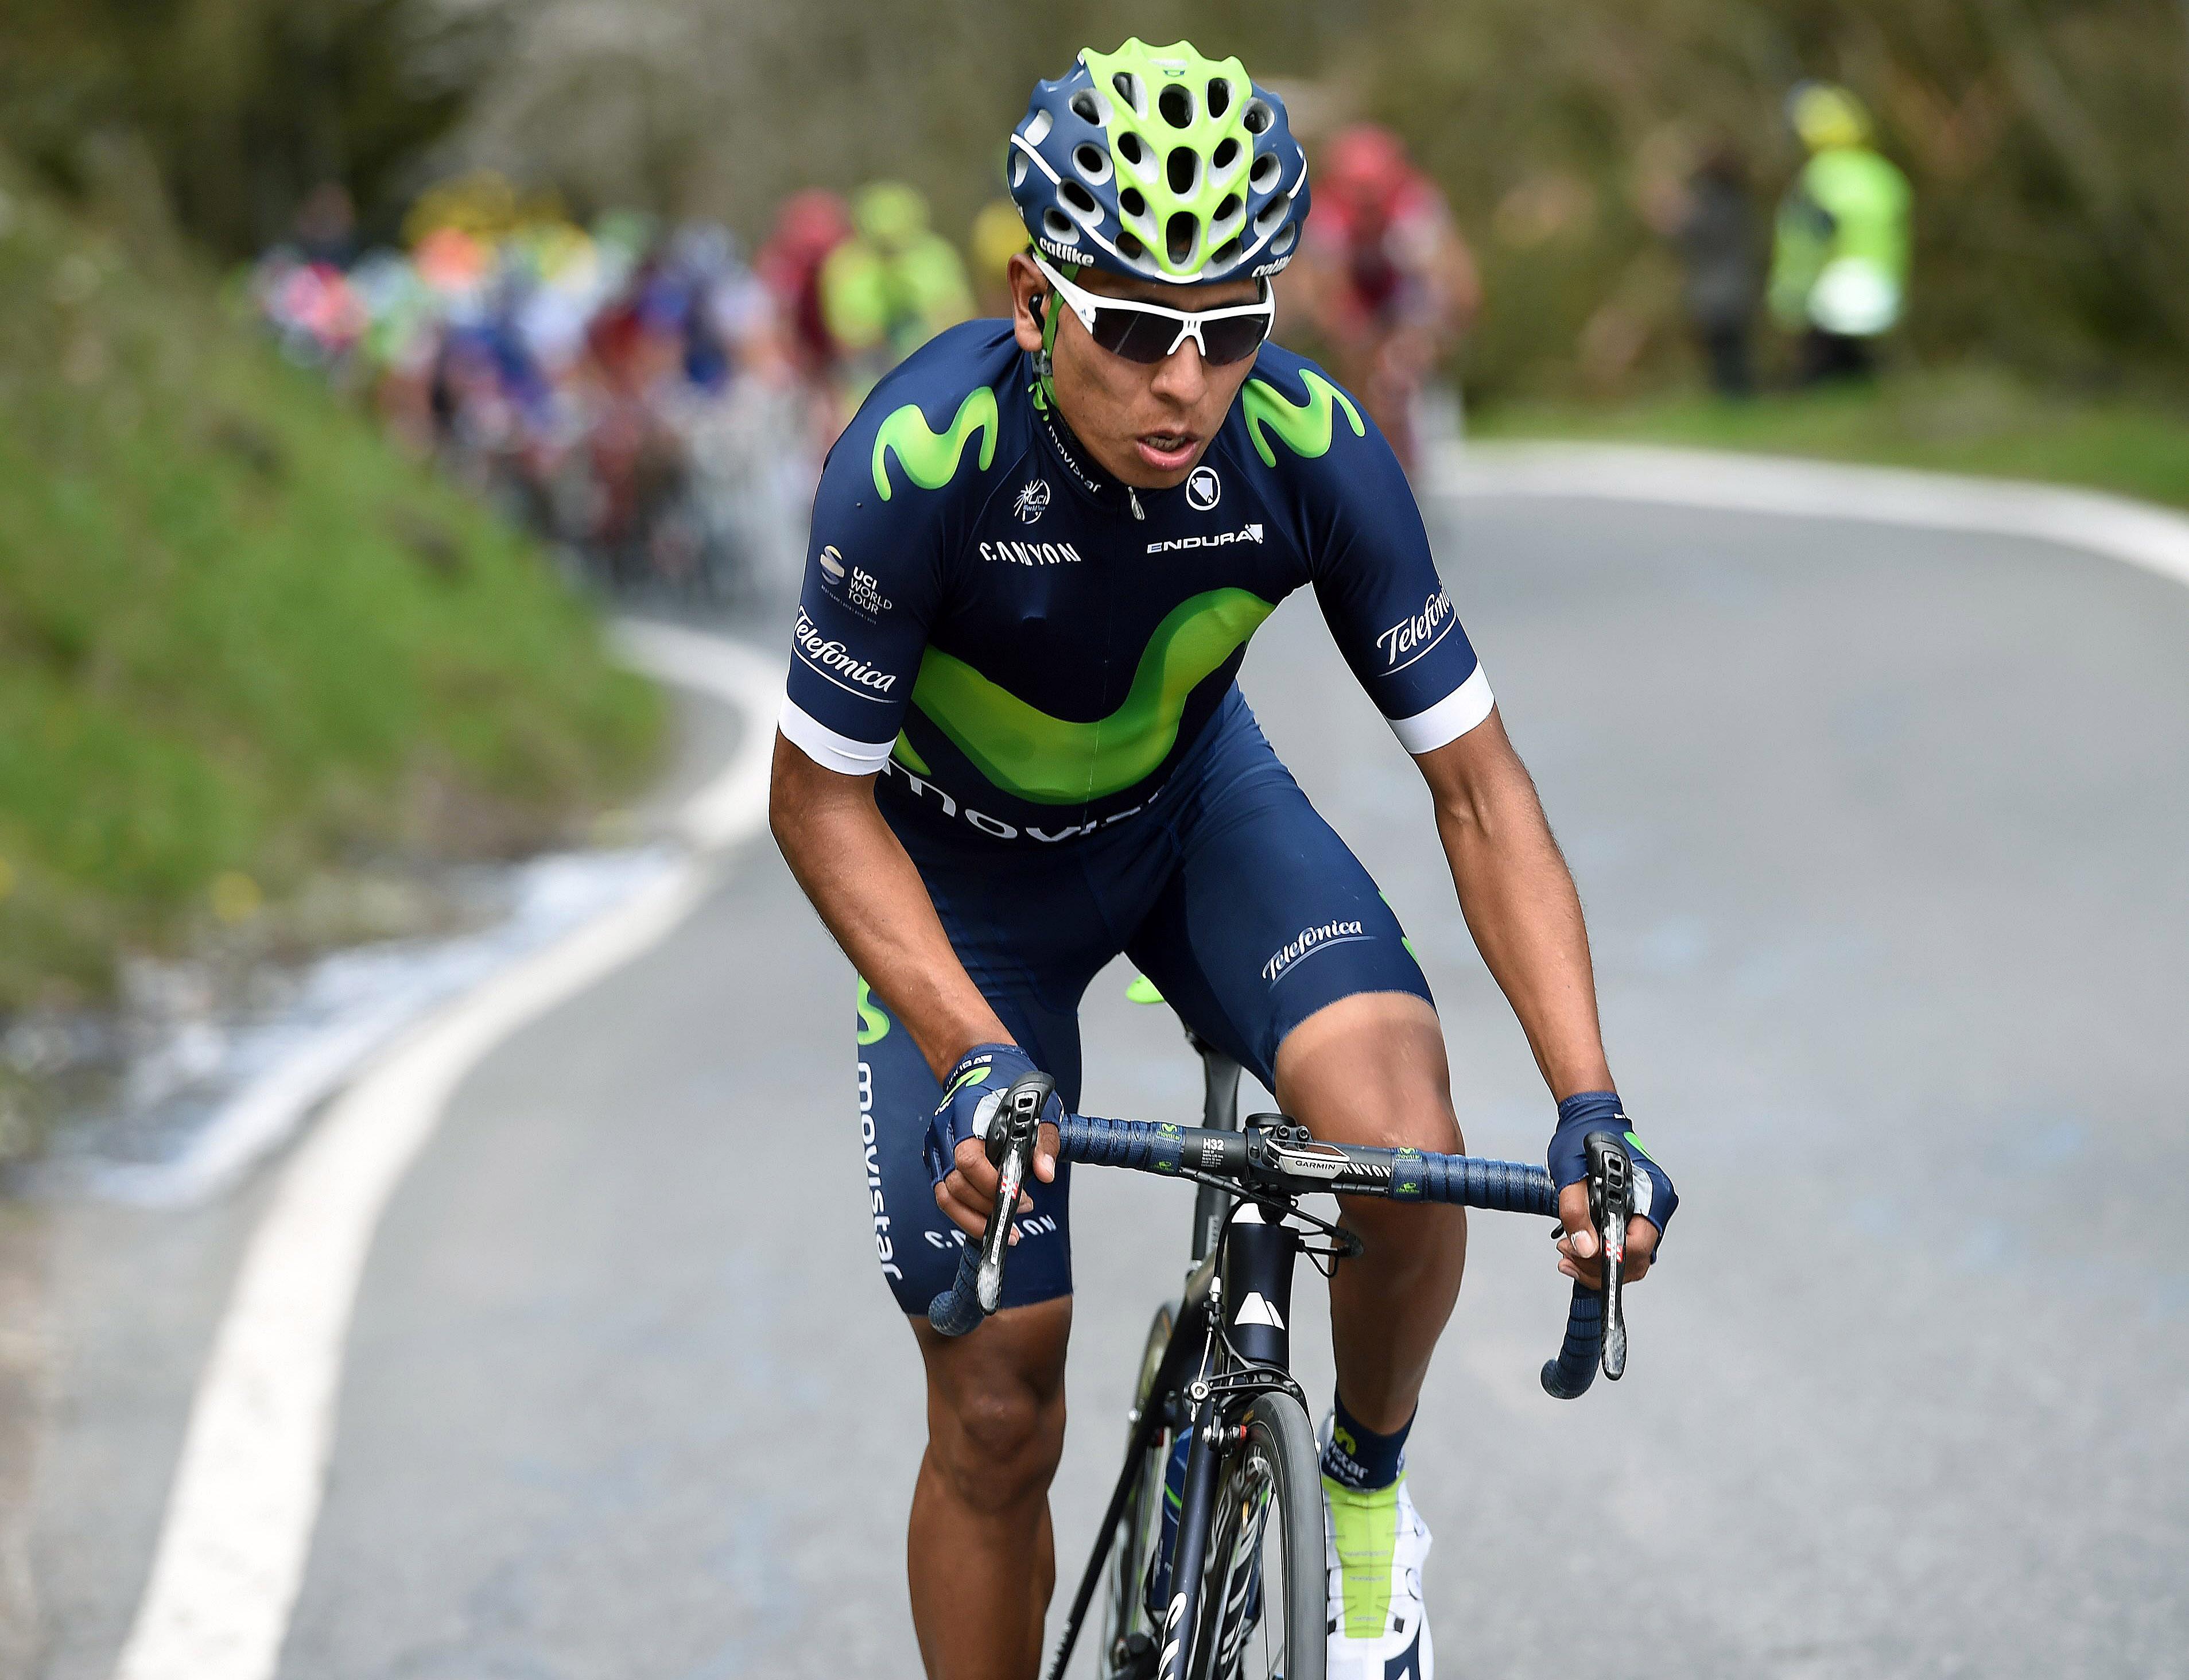 Nairo Quintana sarà al Giro d'Italia 2017